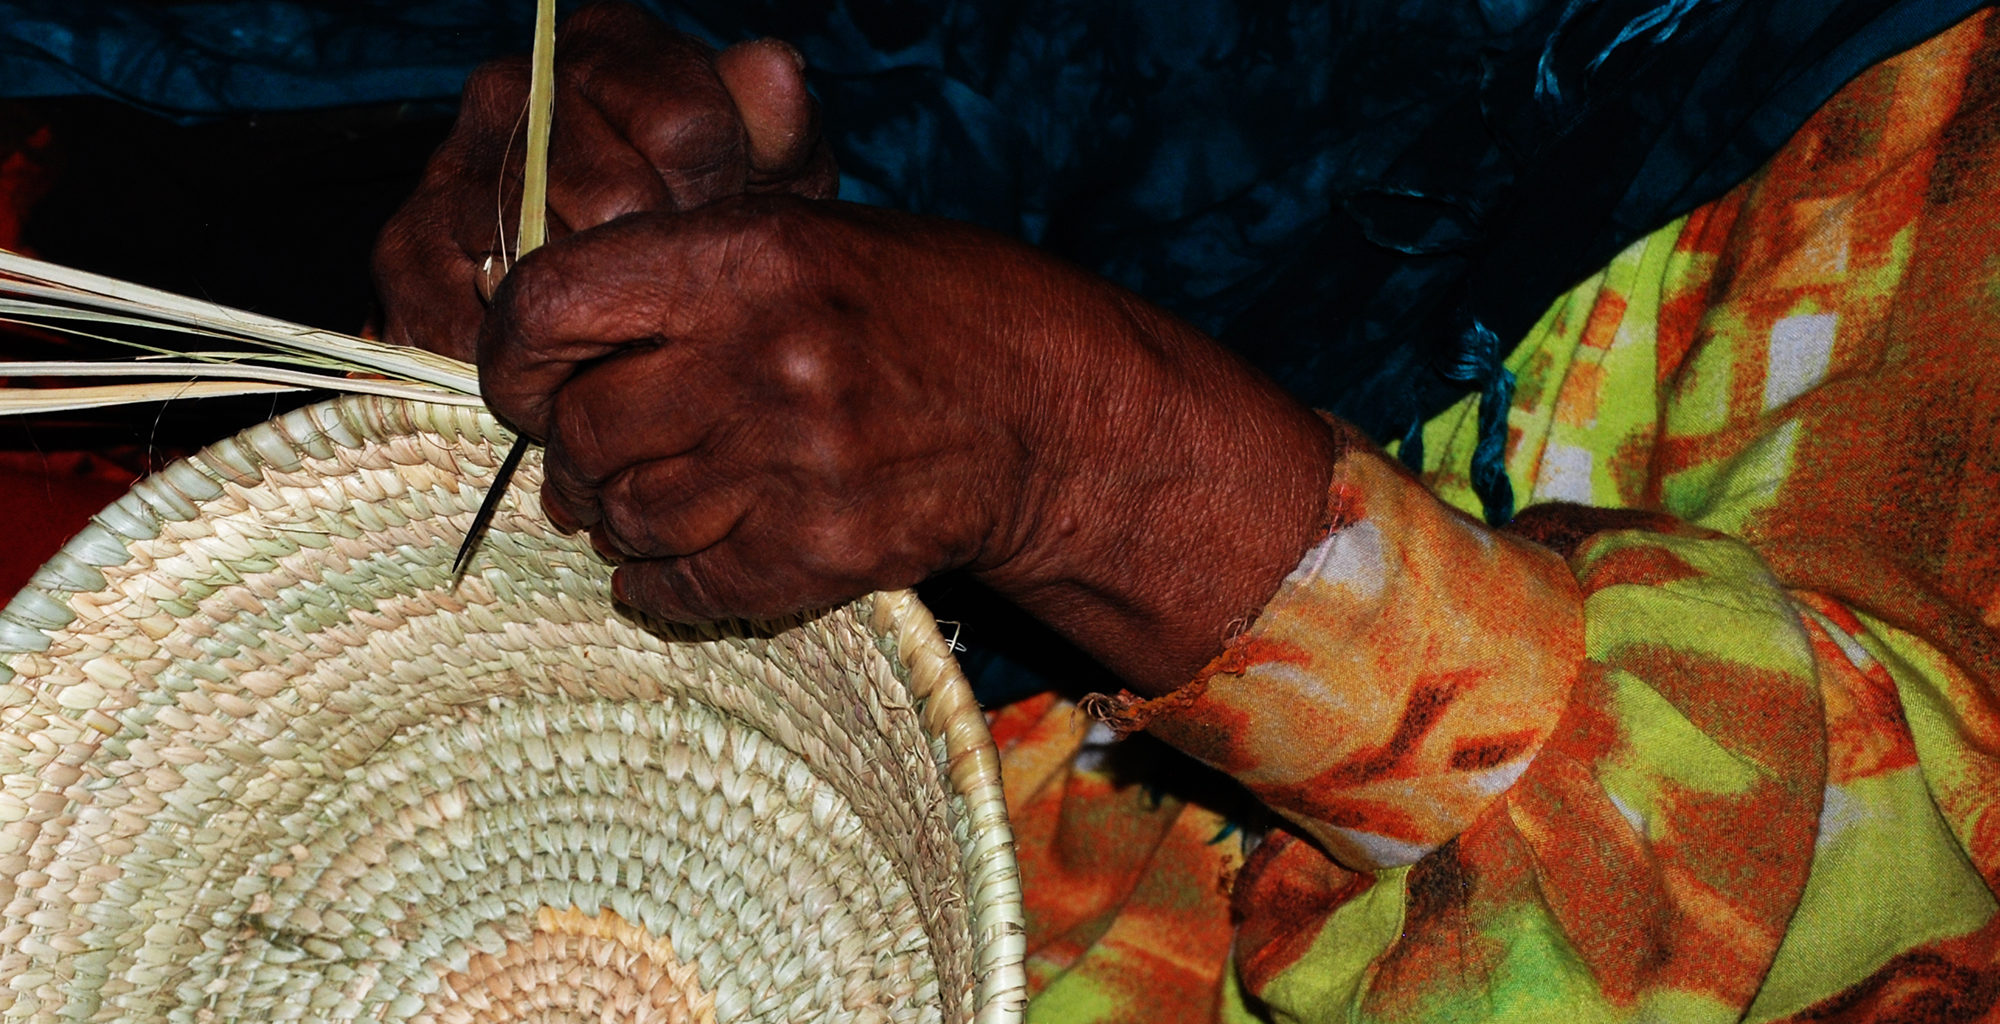 Somaliland-Hargeisa-Weaving